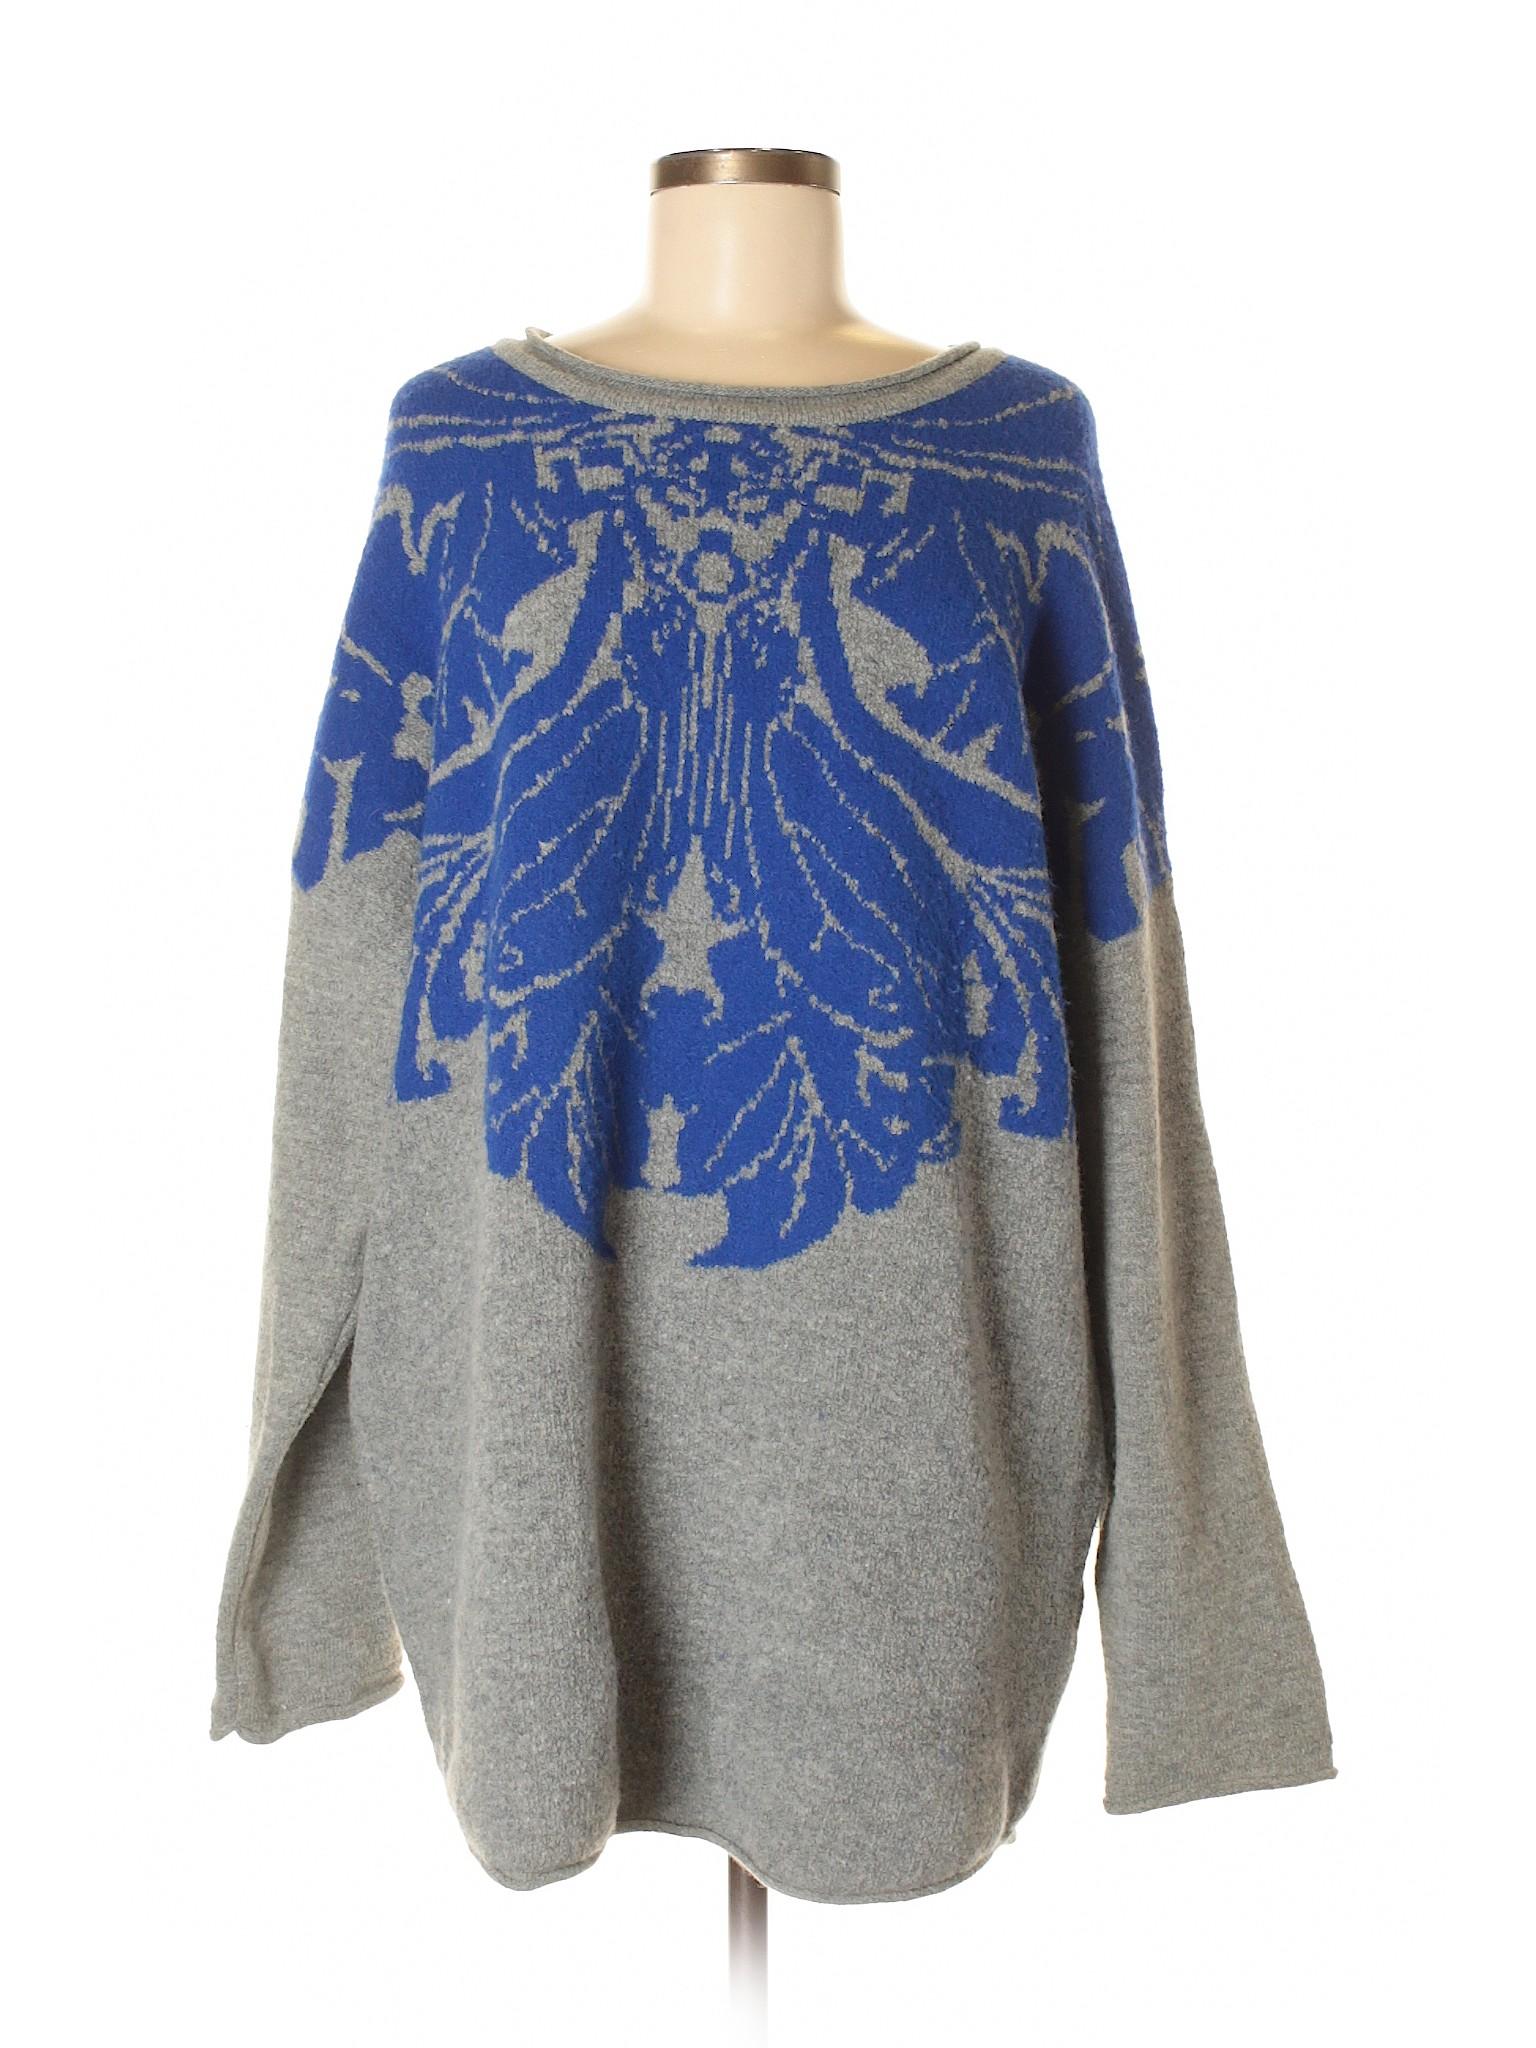 Pullover Boutique Eri Ali Boutique Sweater Eri 0qgvYY